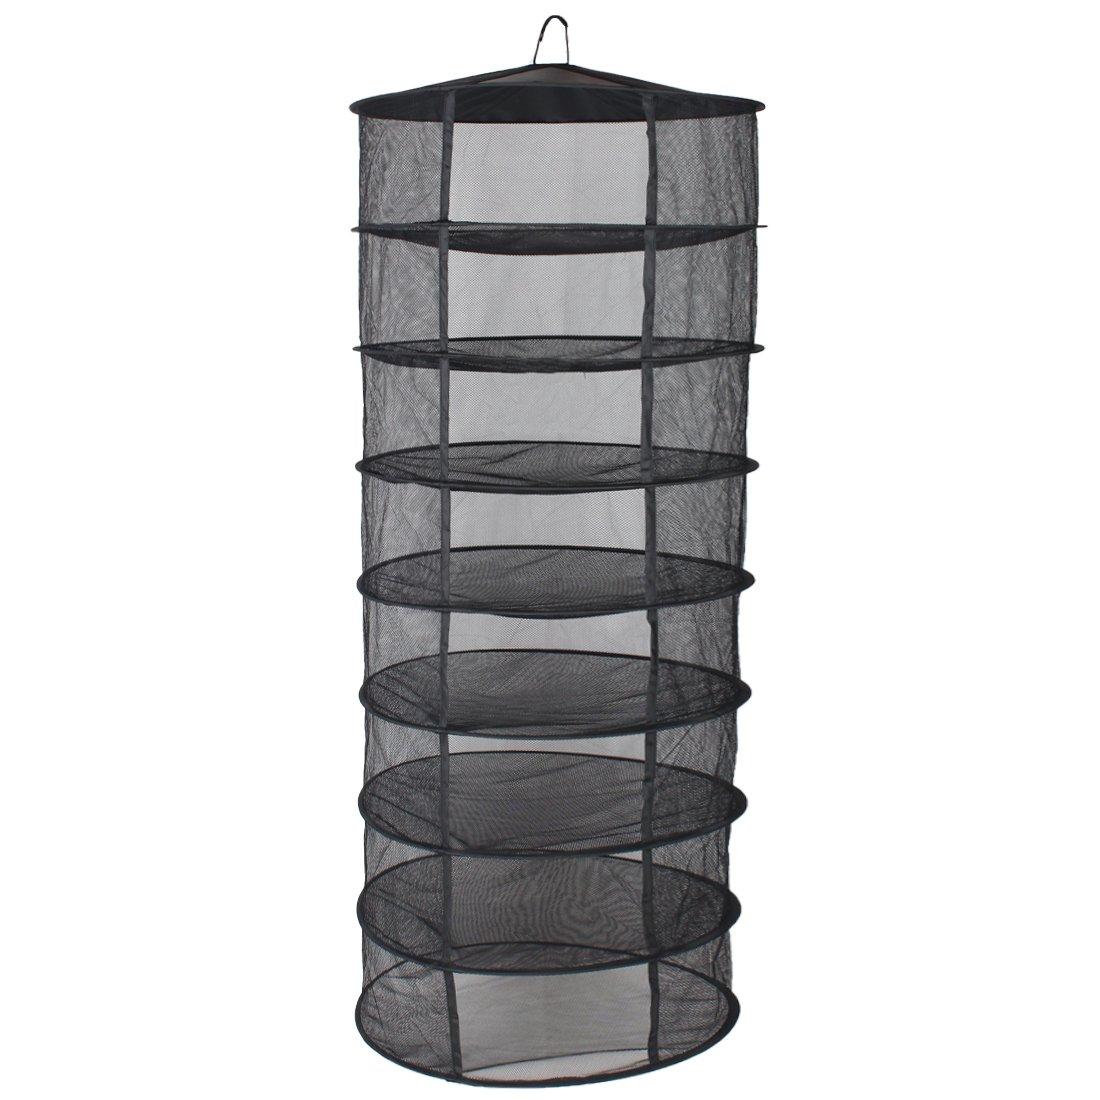 G-LEAF 2-Feet 8-Layer Black Easy Dry Rack Net for plants by Smile Bud